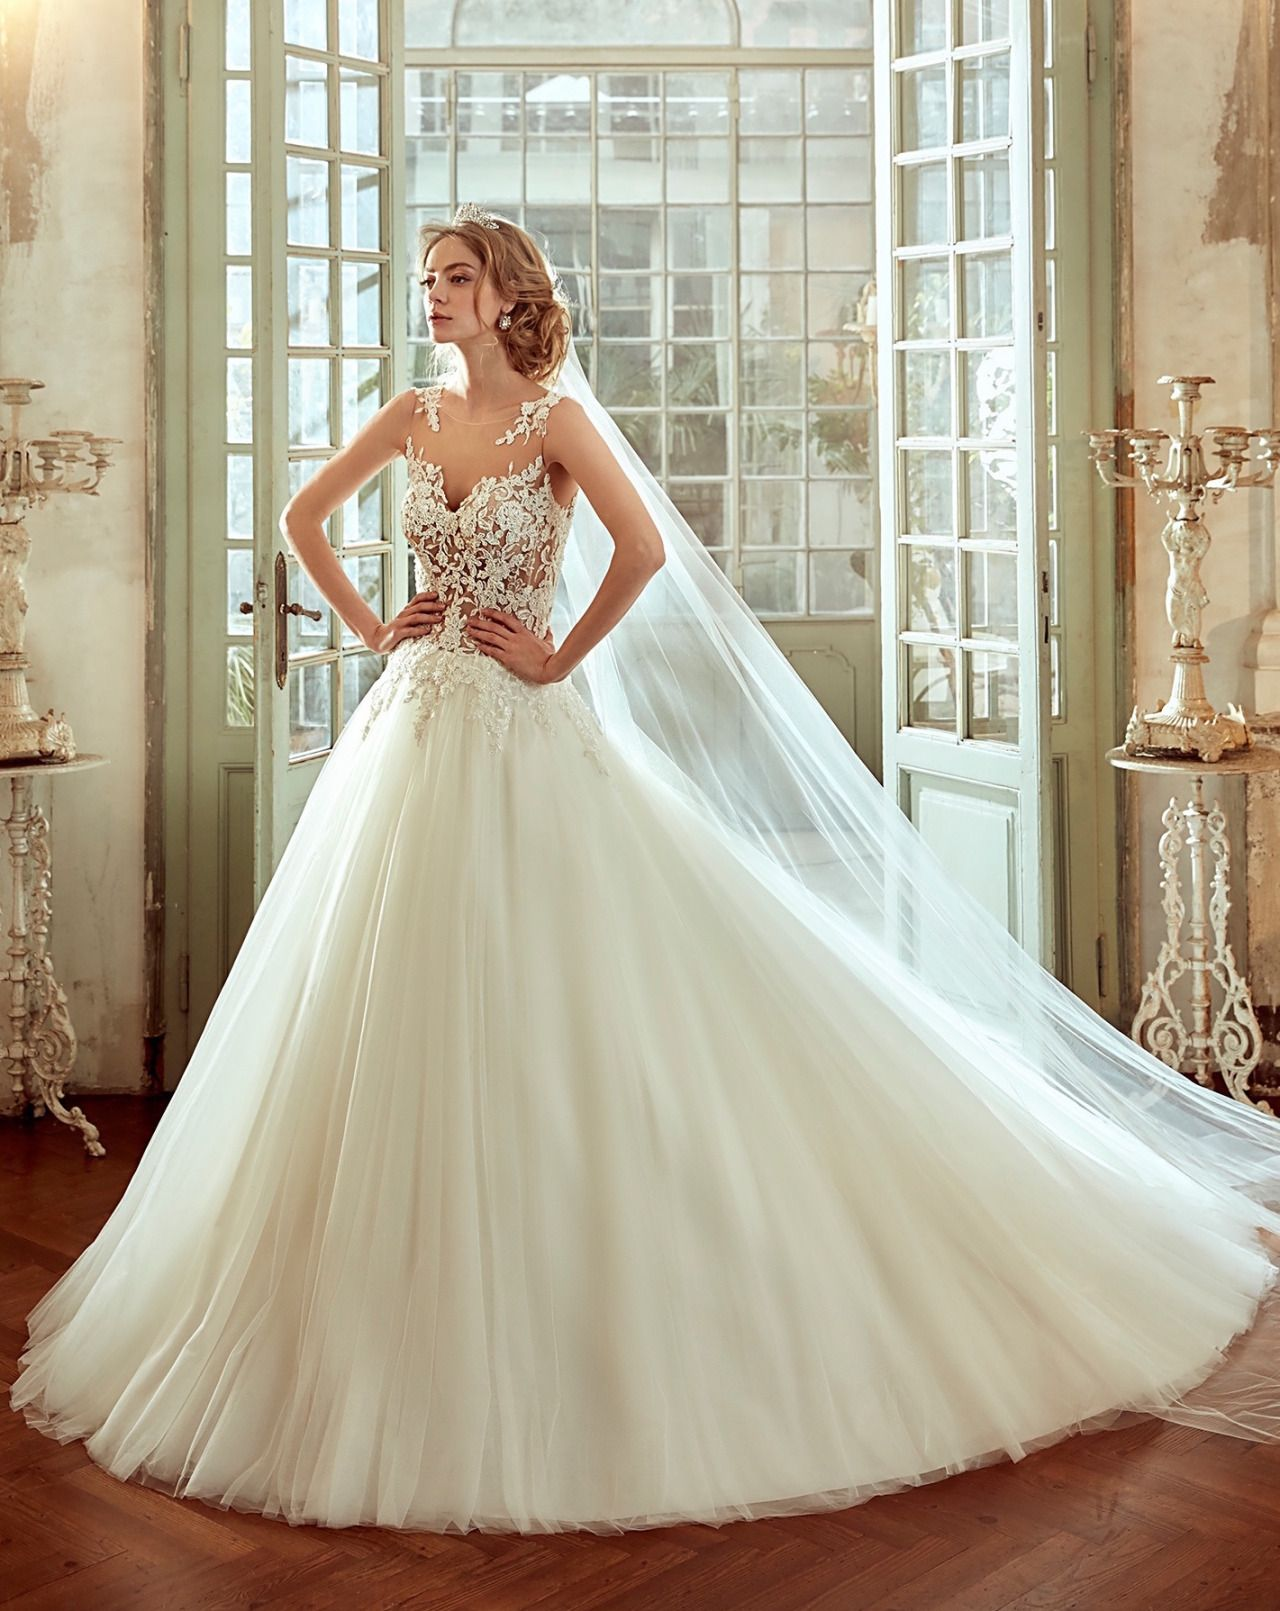 princess wedding dress | Tumblr | Gifs and Things | Pinterest ...